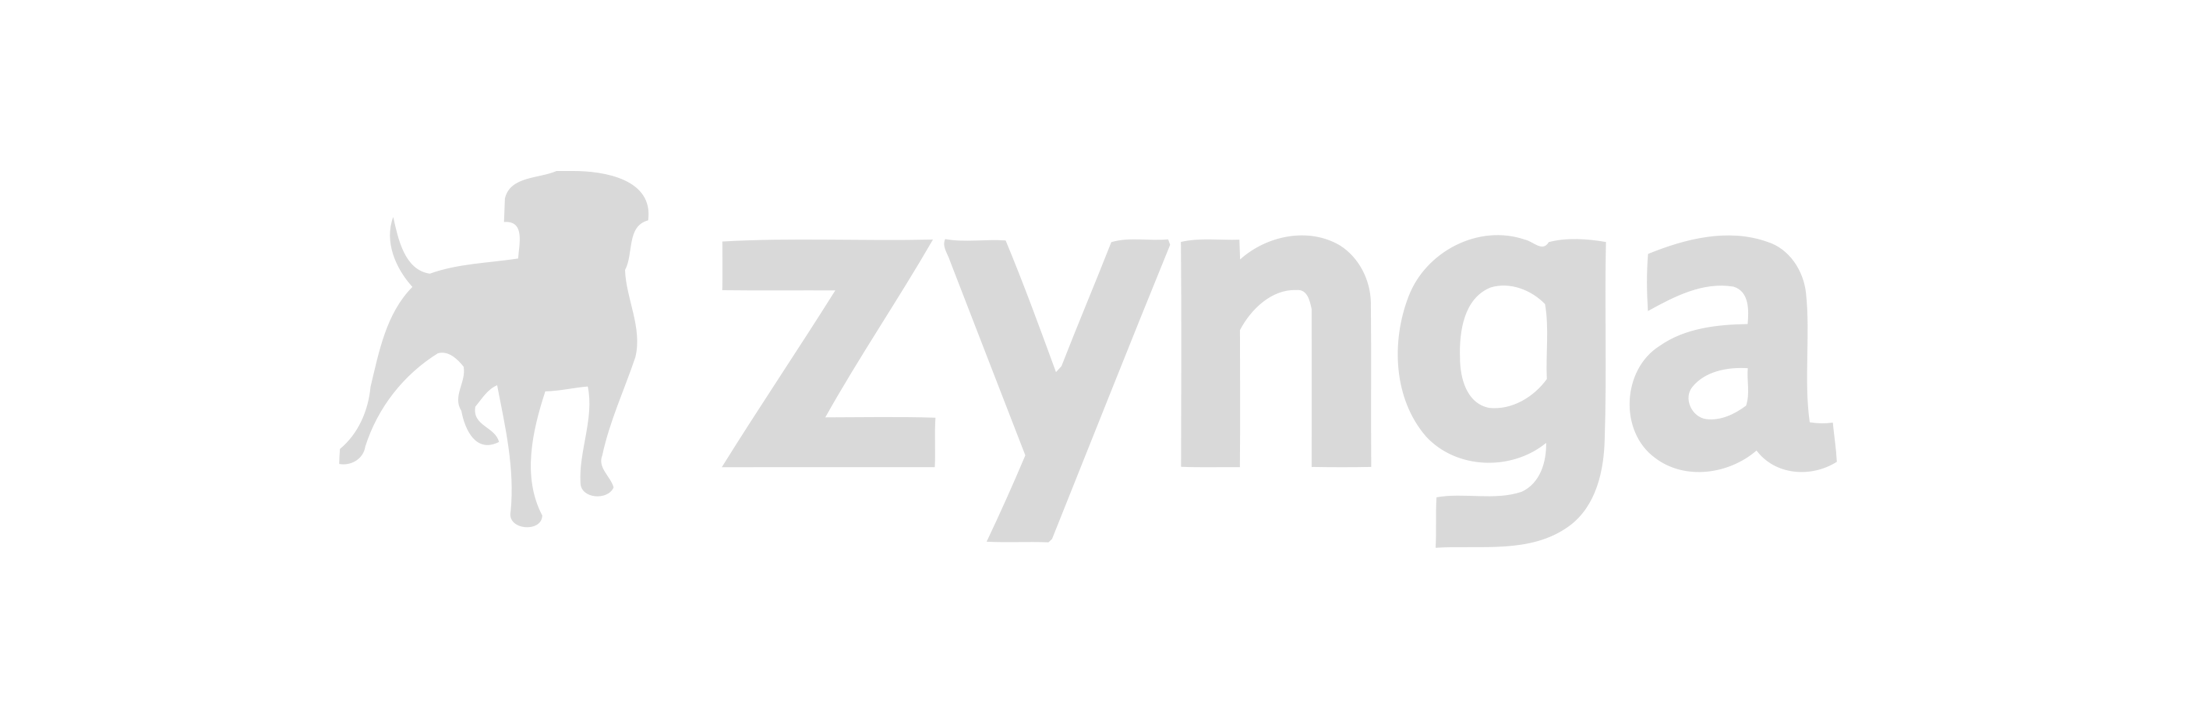 1grey_zynga-logo copy.png